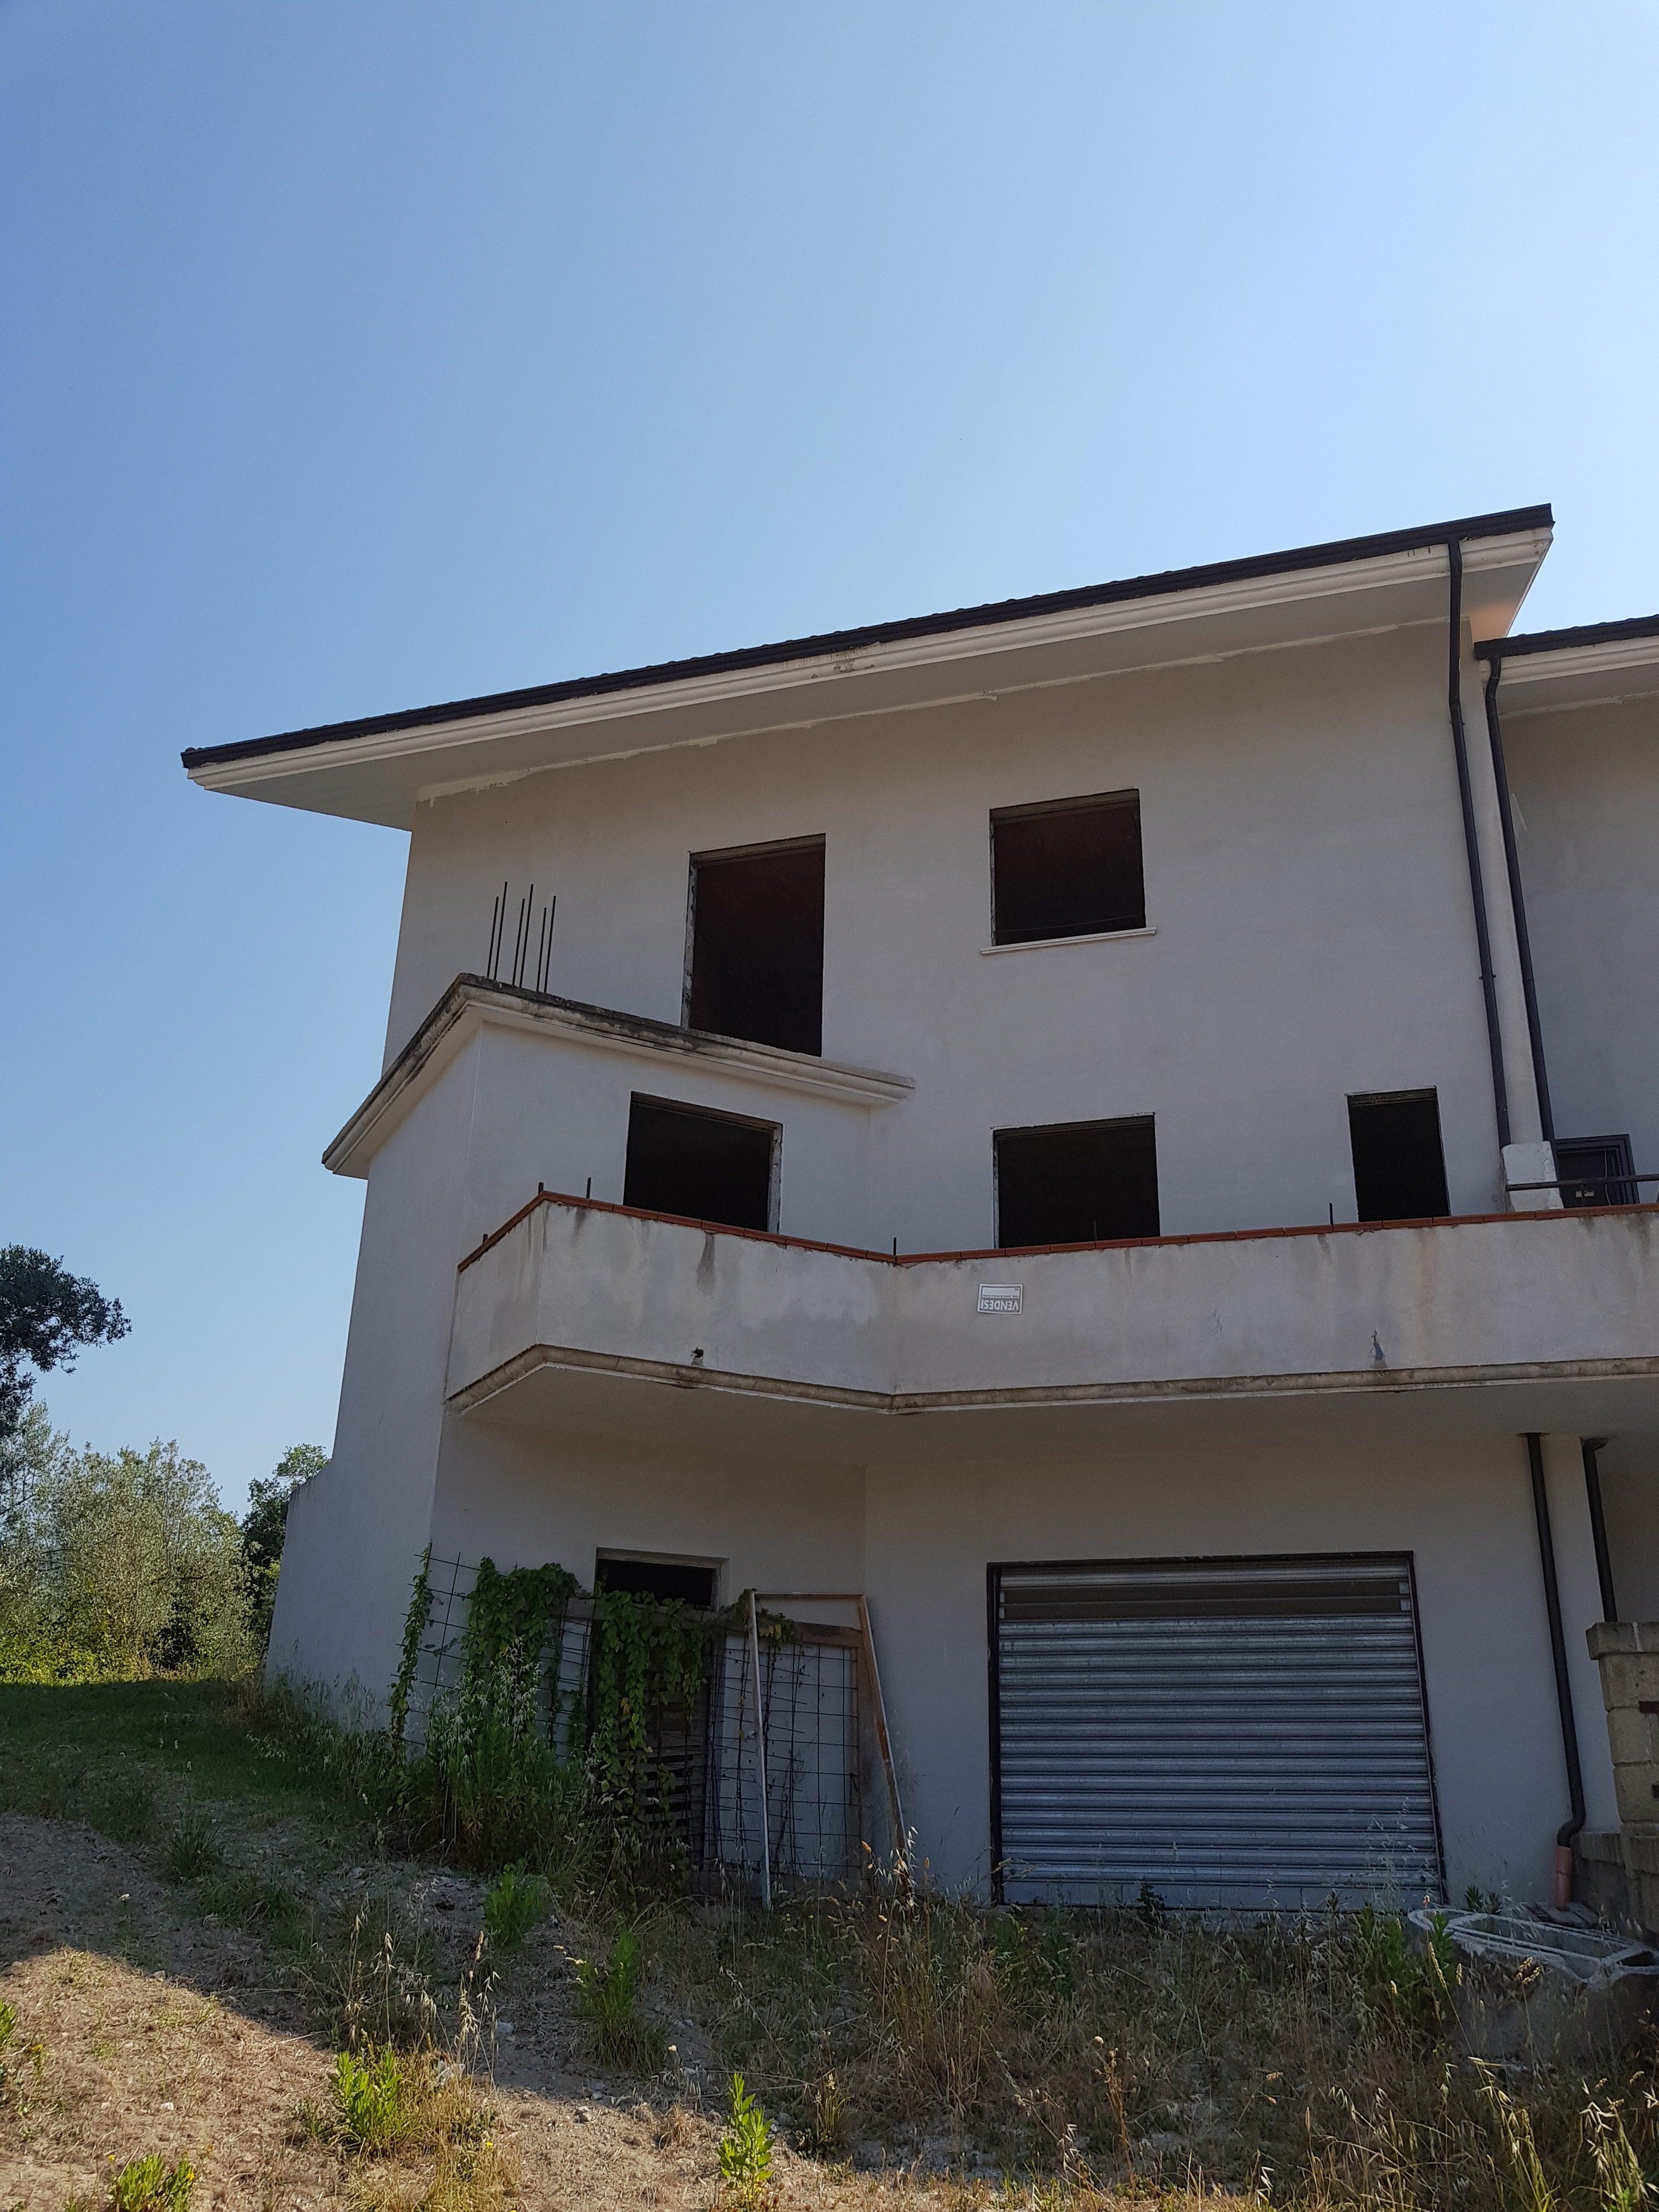 Tuoro – Zona residenziale